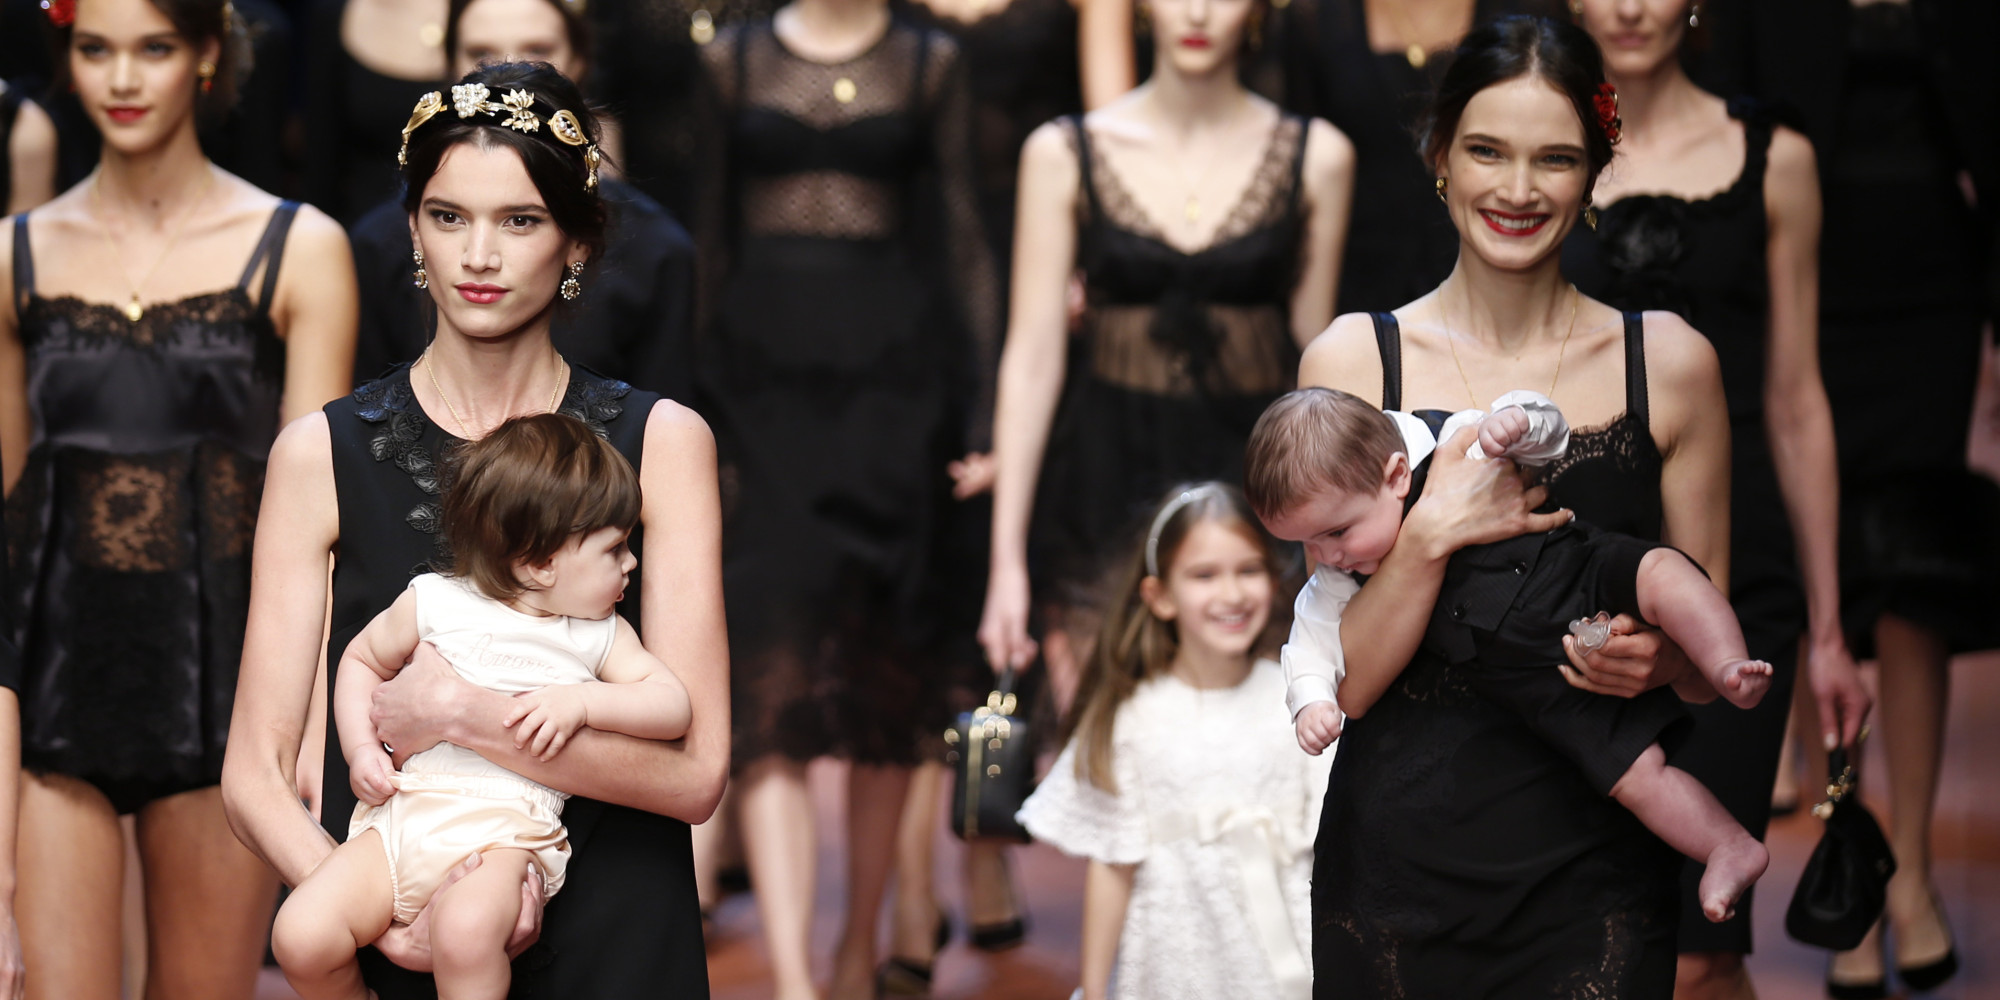 Dolce & Gabbana's Fall 2015 Show Celebrates 'Mamma' With Baby ...